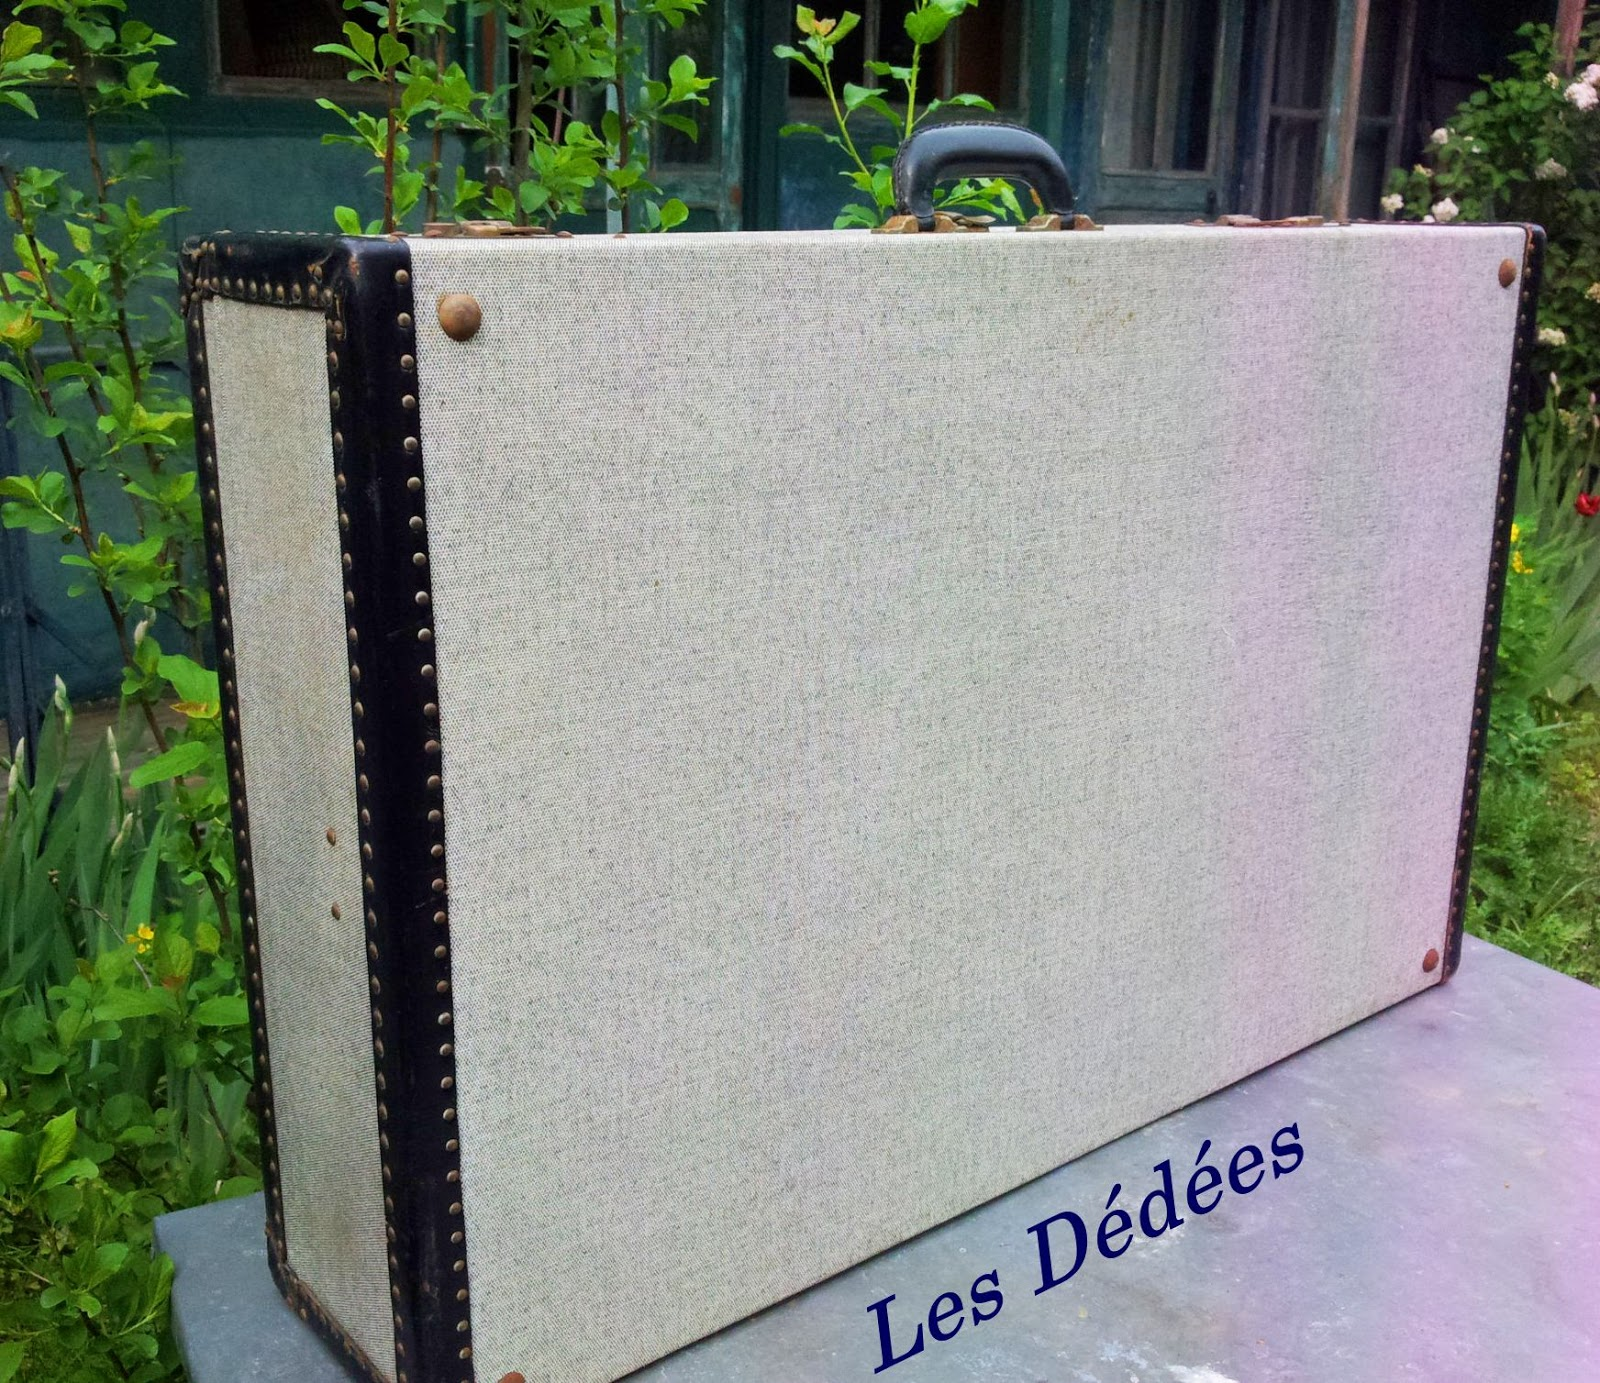 valise cabine ikea starttid bagage cabine roulettes ikea sac dos valise uppt cka ikea annonce. Black Bedroom Furniture Sets. Home Design Ideas